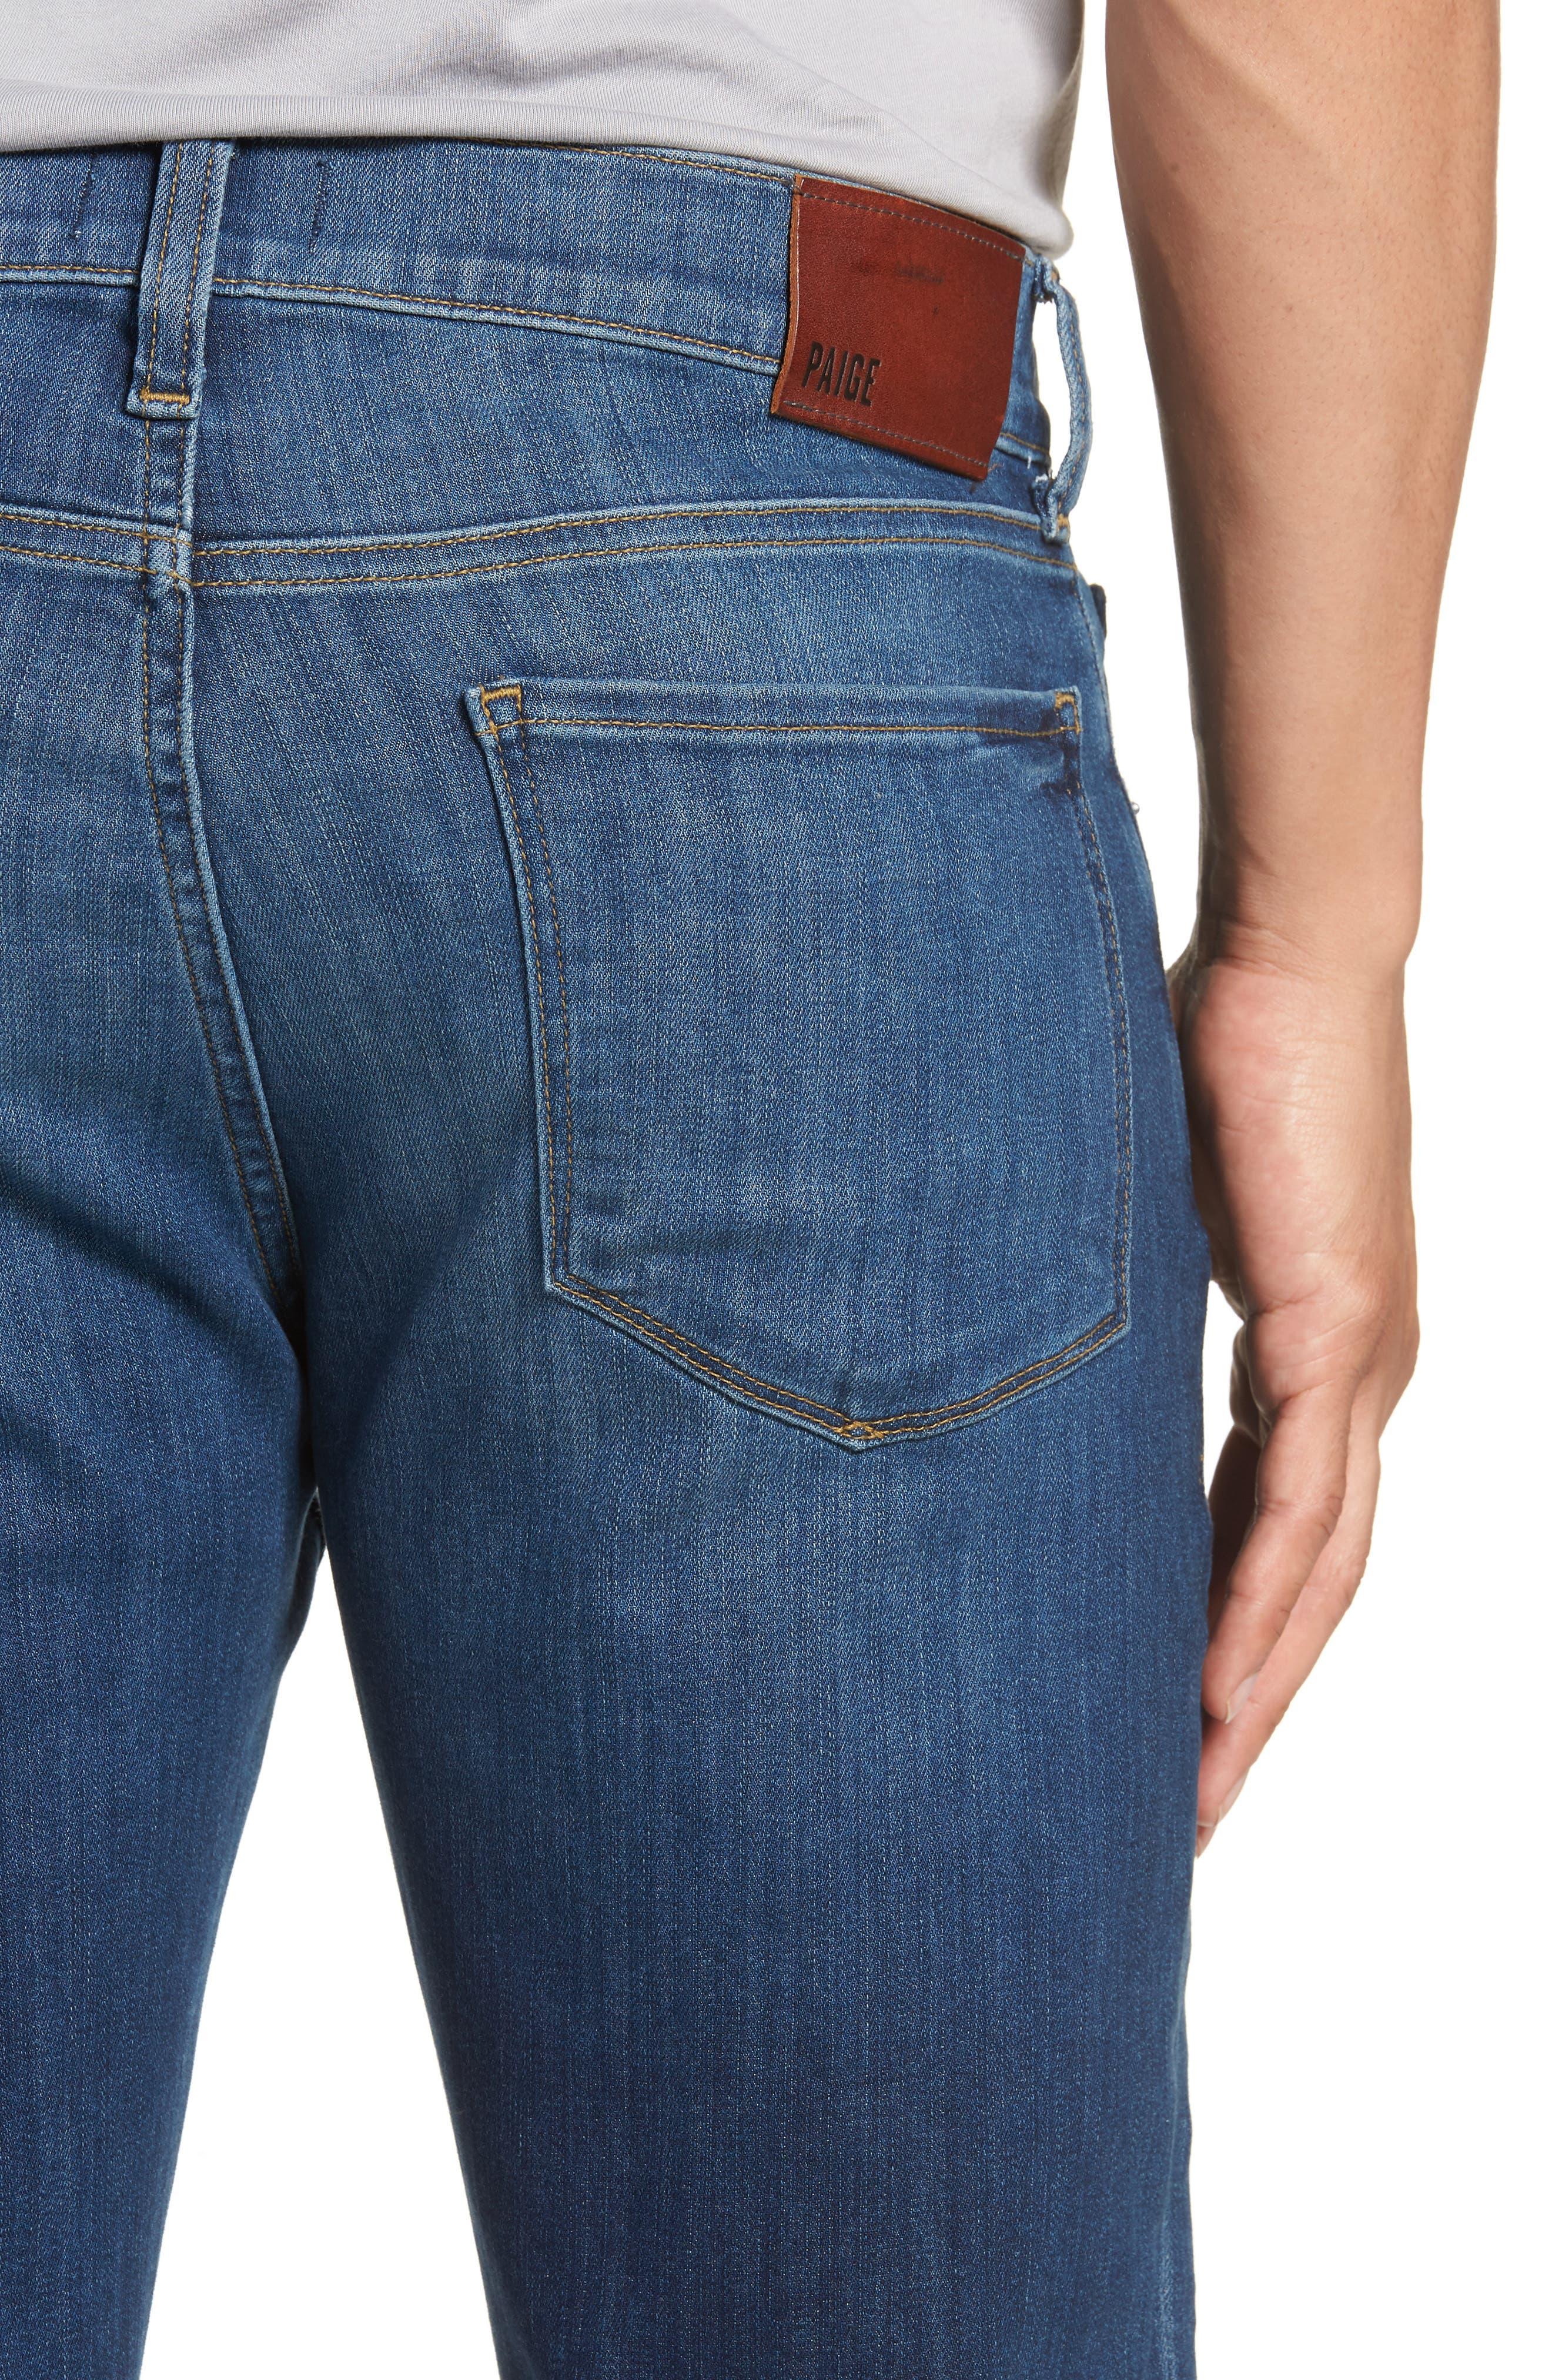 Transcend - Lennox Slim Fit Jeans,                             Alternate thumbnail 5, color,                             Ashbrook